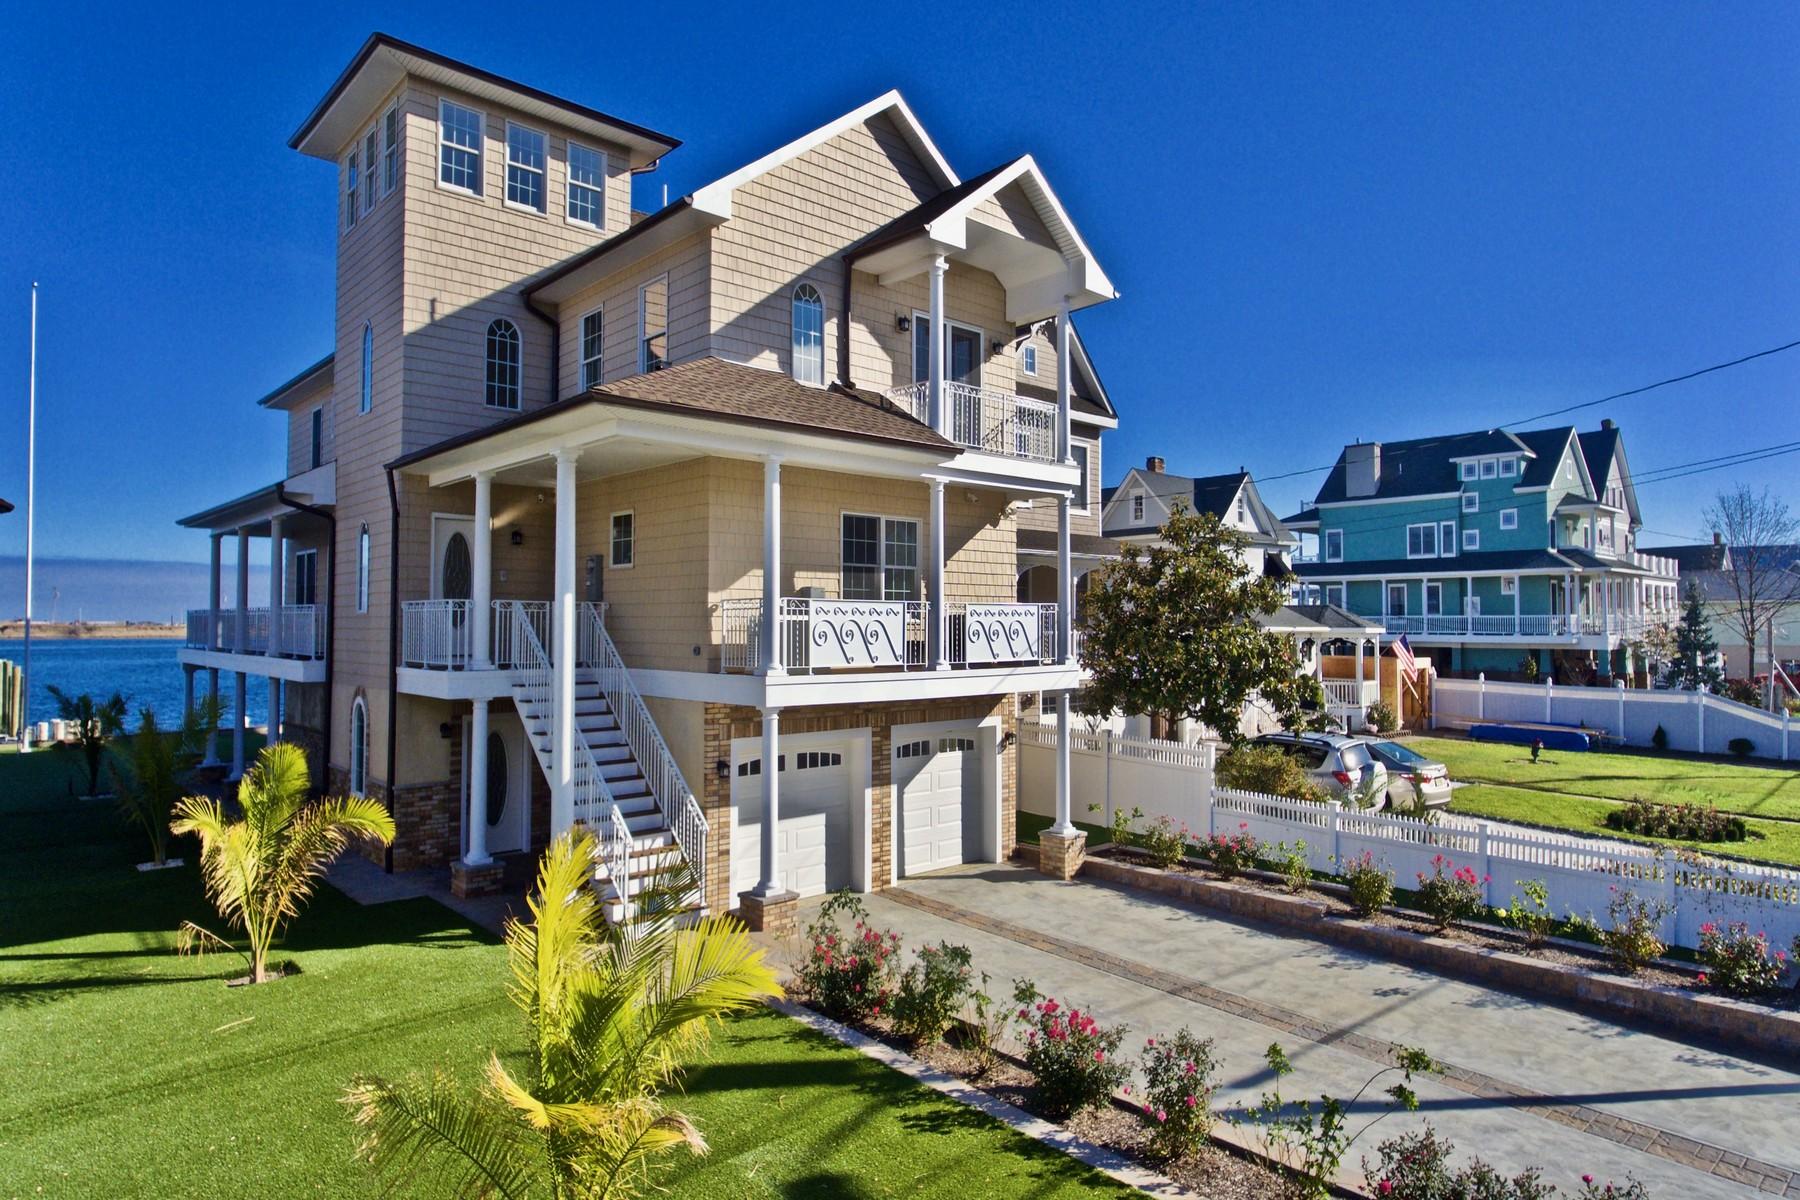 Single Family Home for Sale at 36 Shrewbury Ave. 36 Shrewsbury Ave. Highlands, 07732 United States